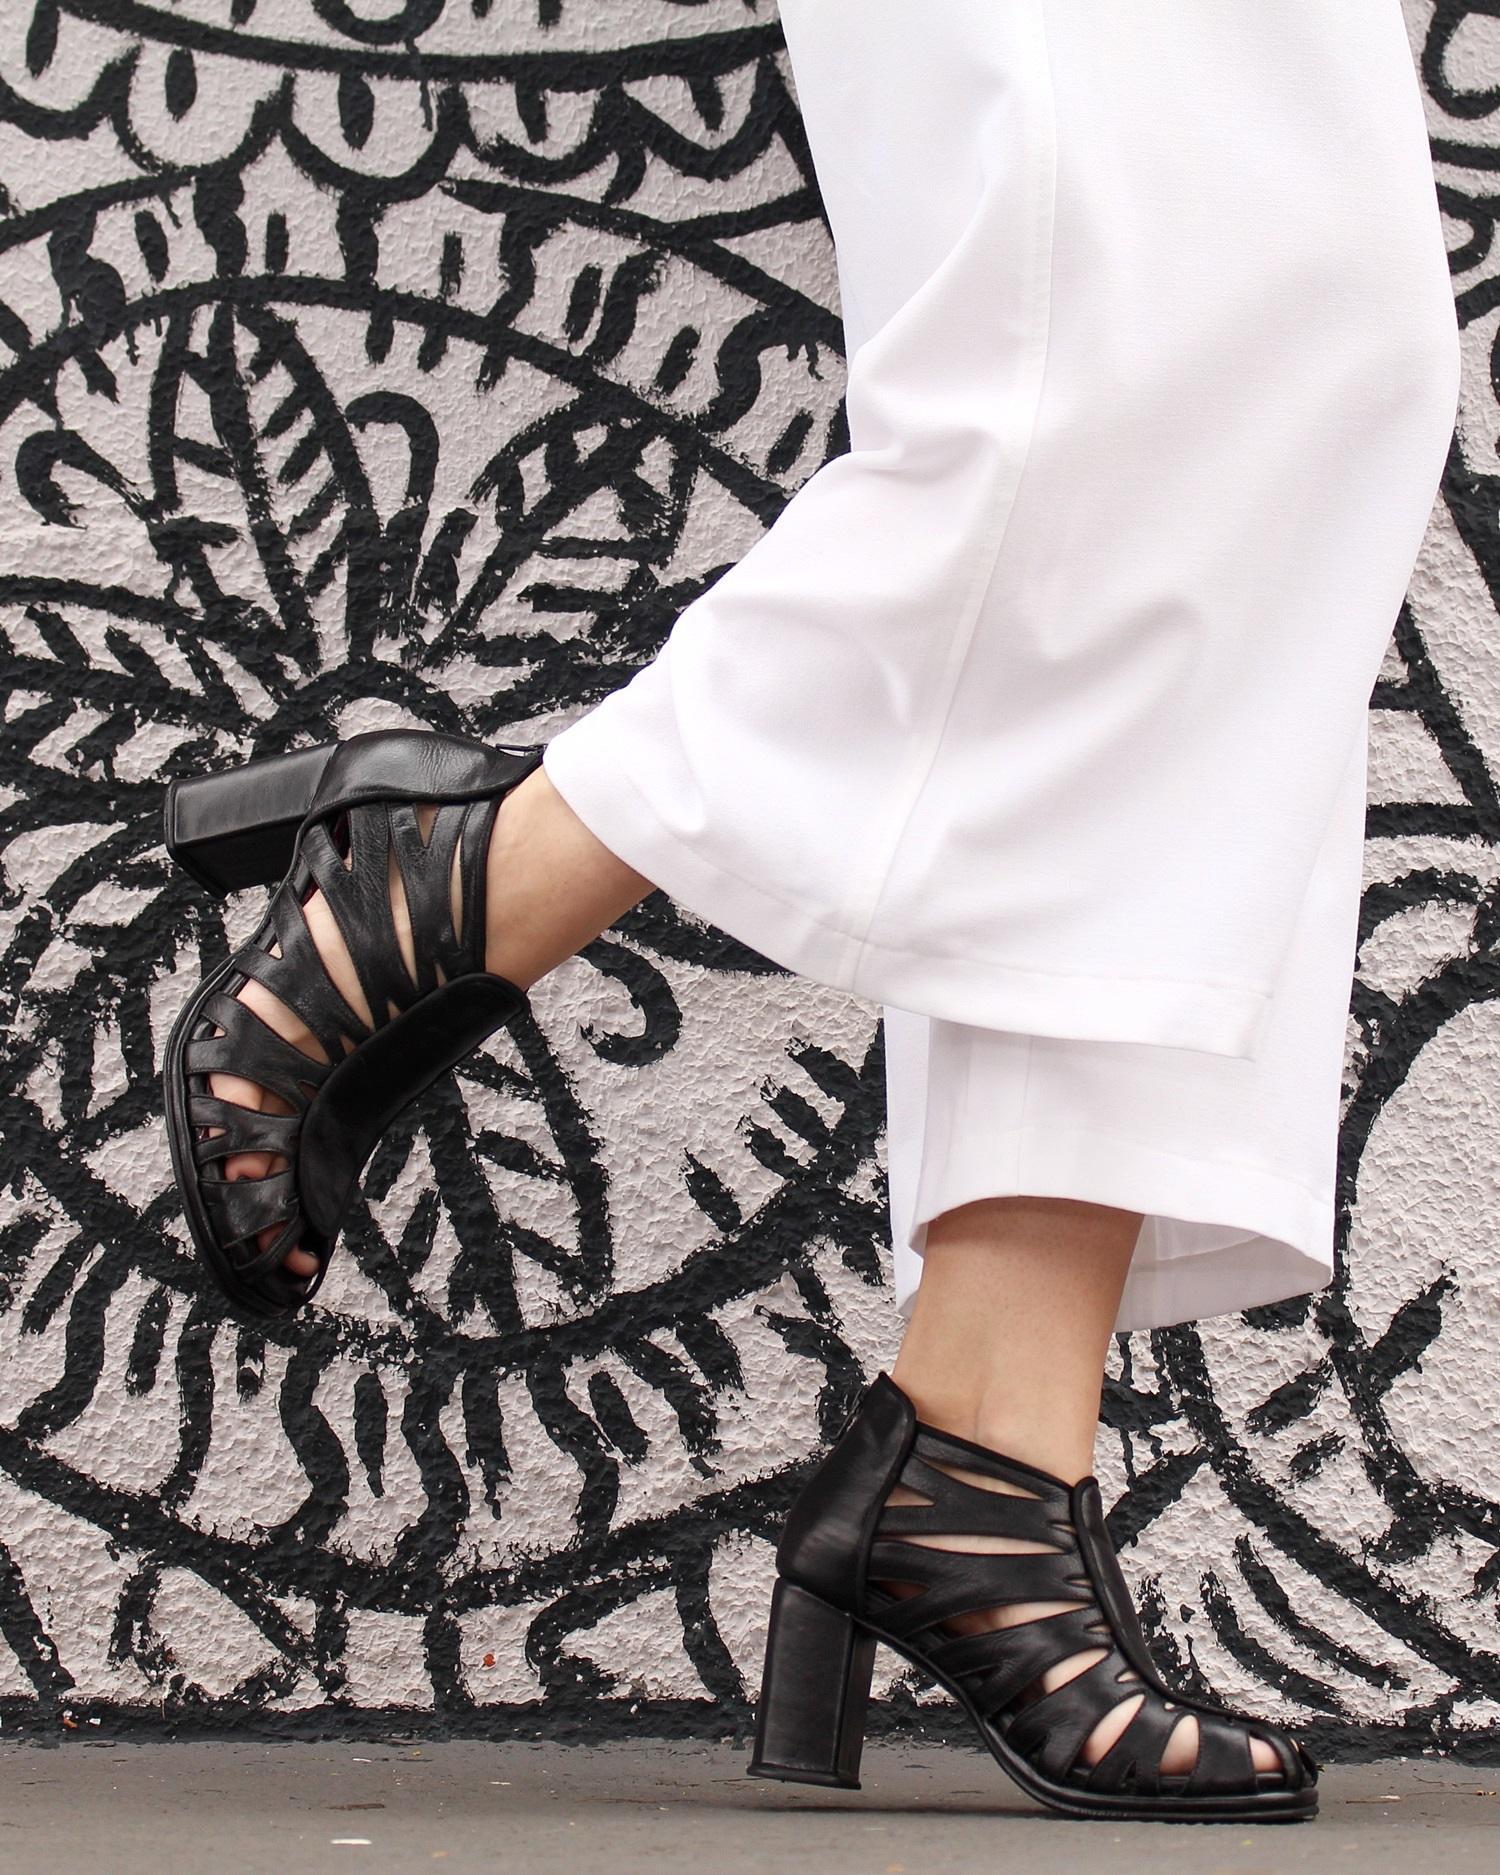 sandalia-salto-grosso-look-cool-fashionista-moderno-minimalista-pantacourt-colete-gola-alta-blog-vanduarte-3